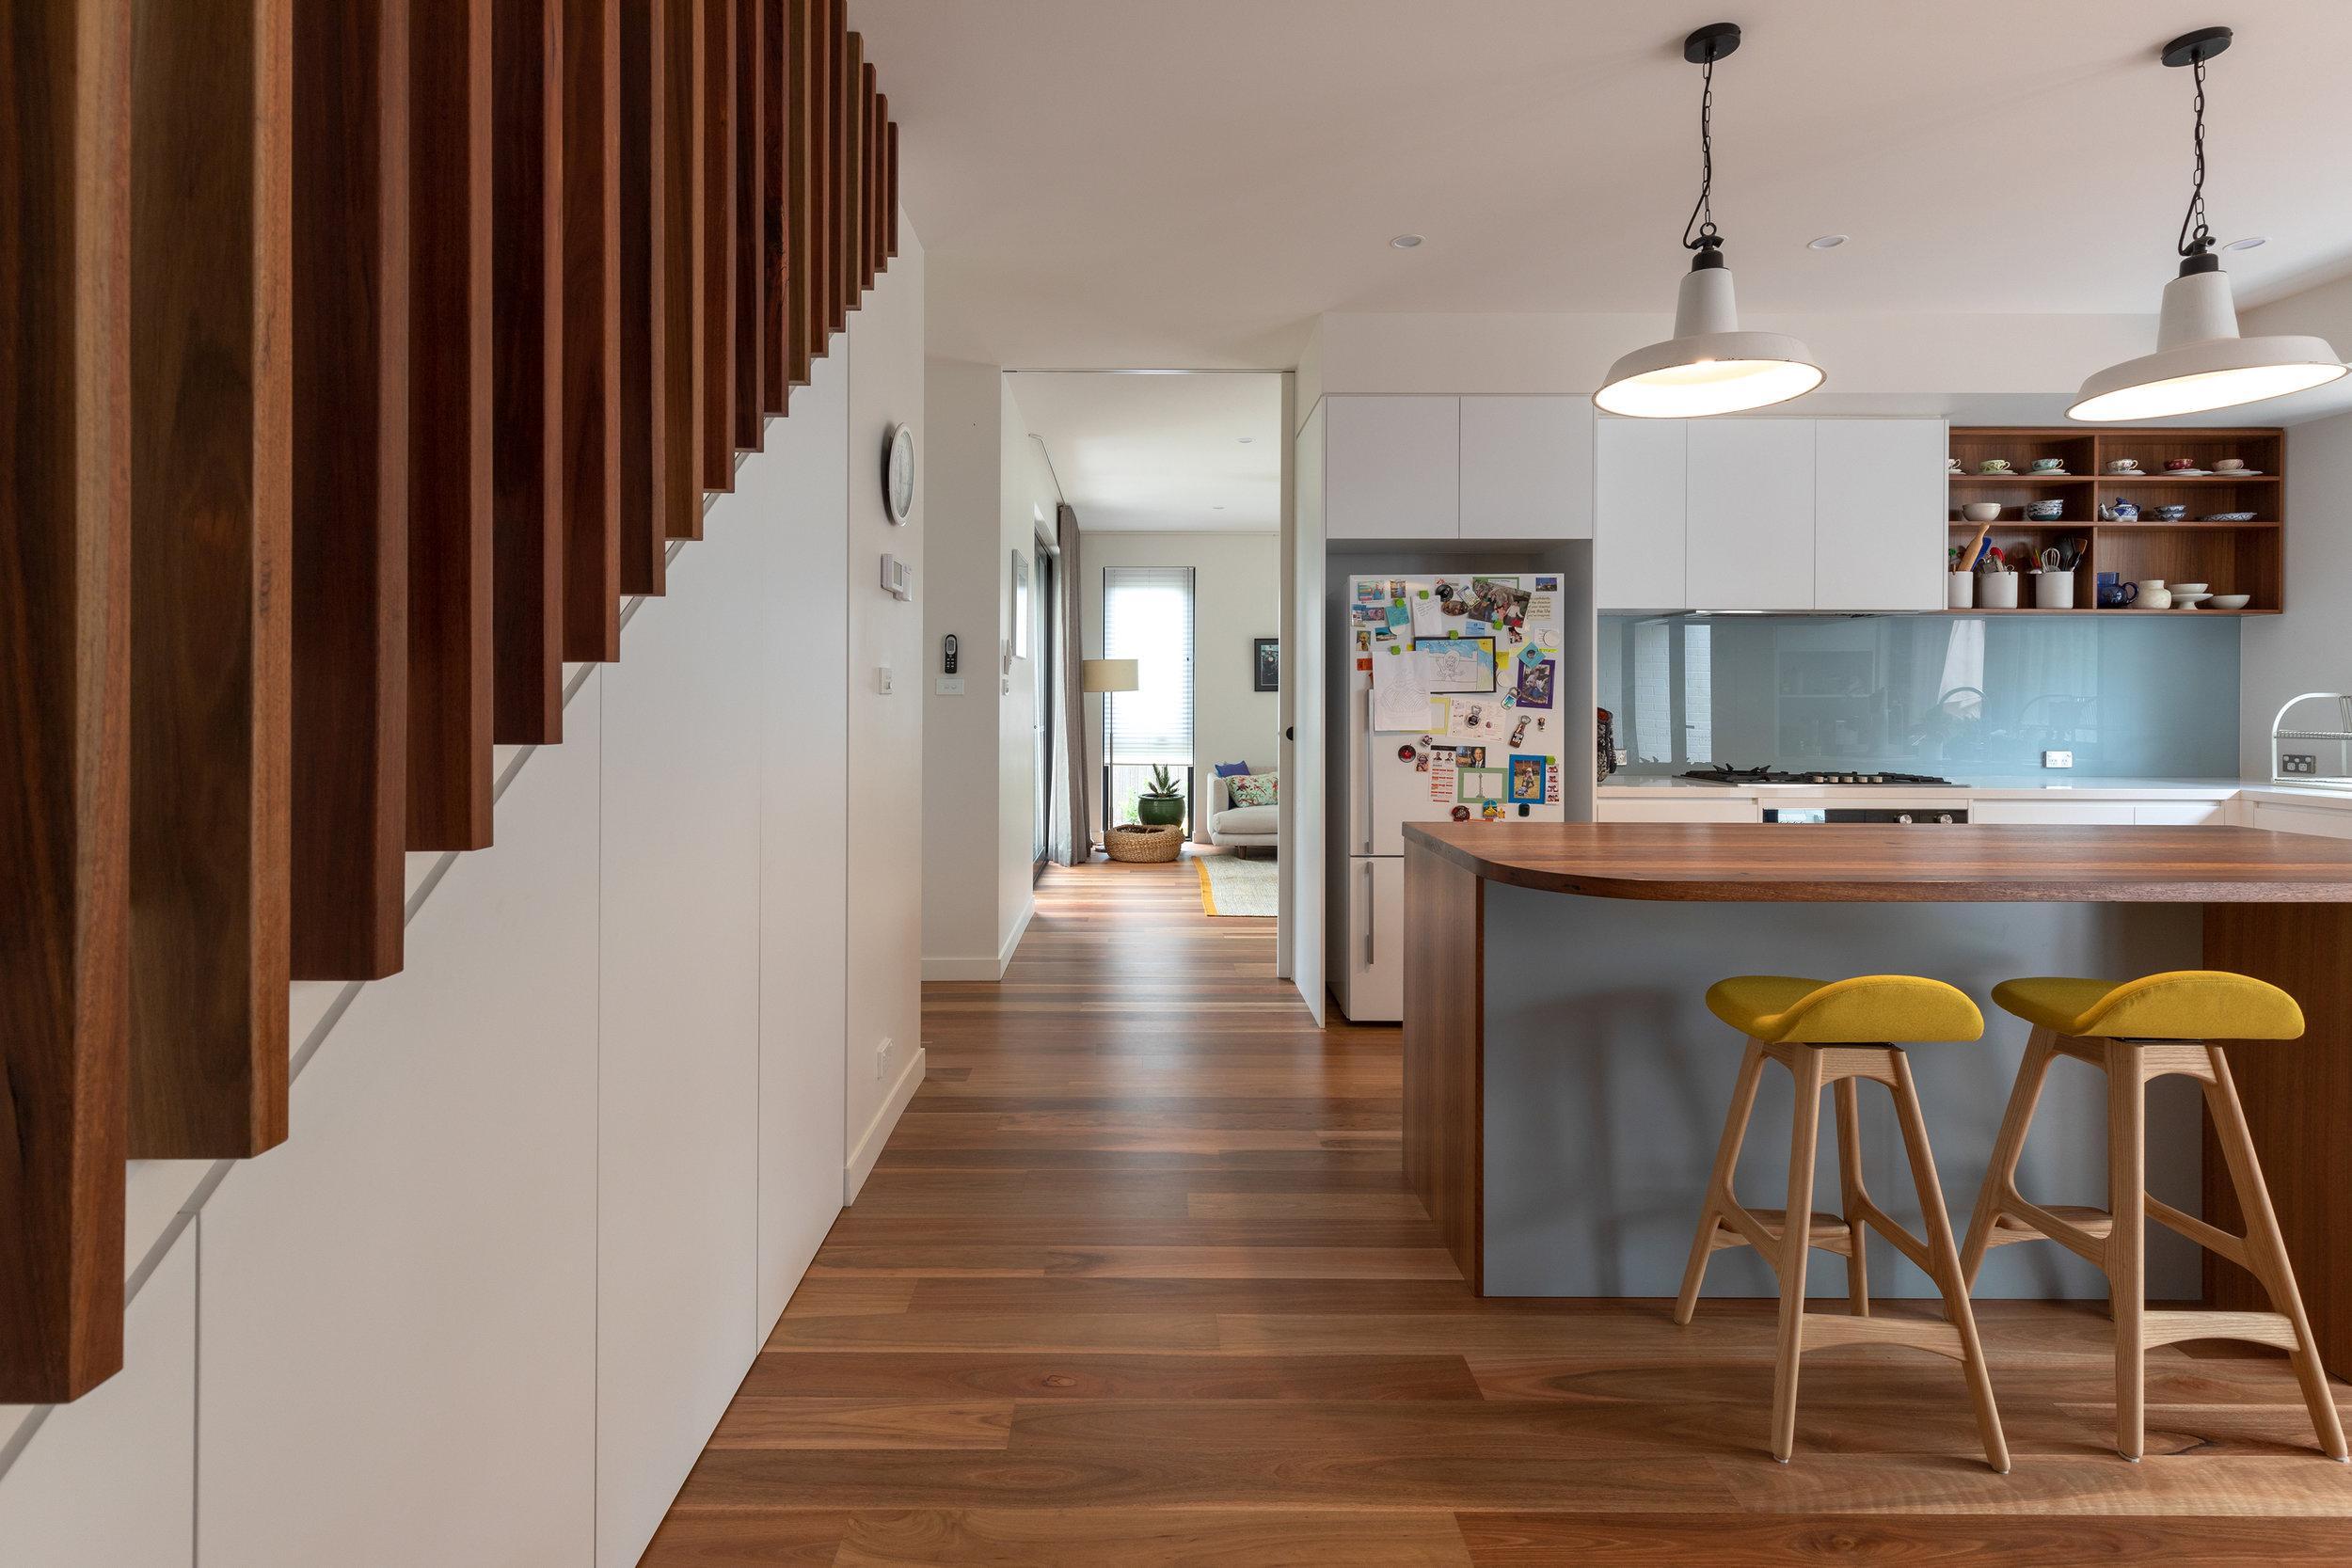 2917-resnew_Ribbon House_Rob Henry Architects_Light Studies_05.jpg